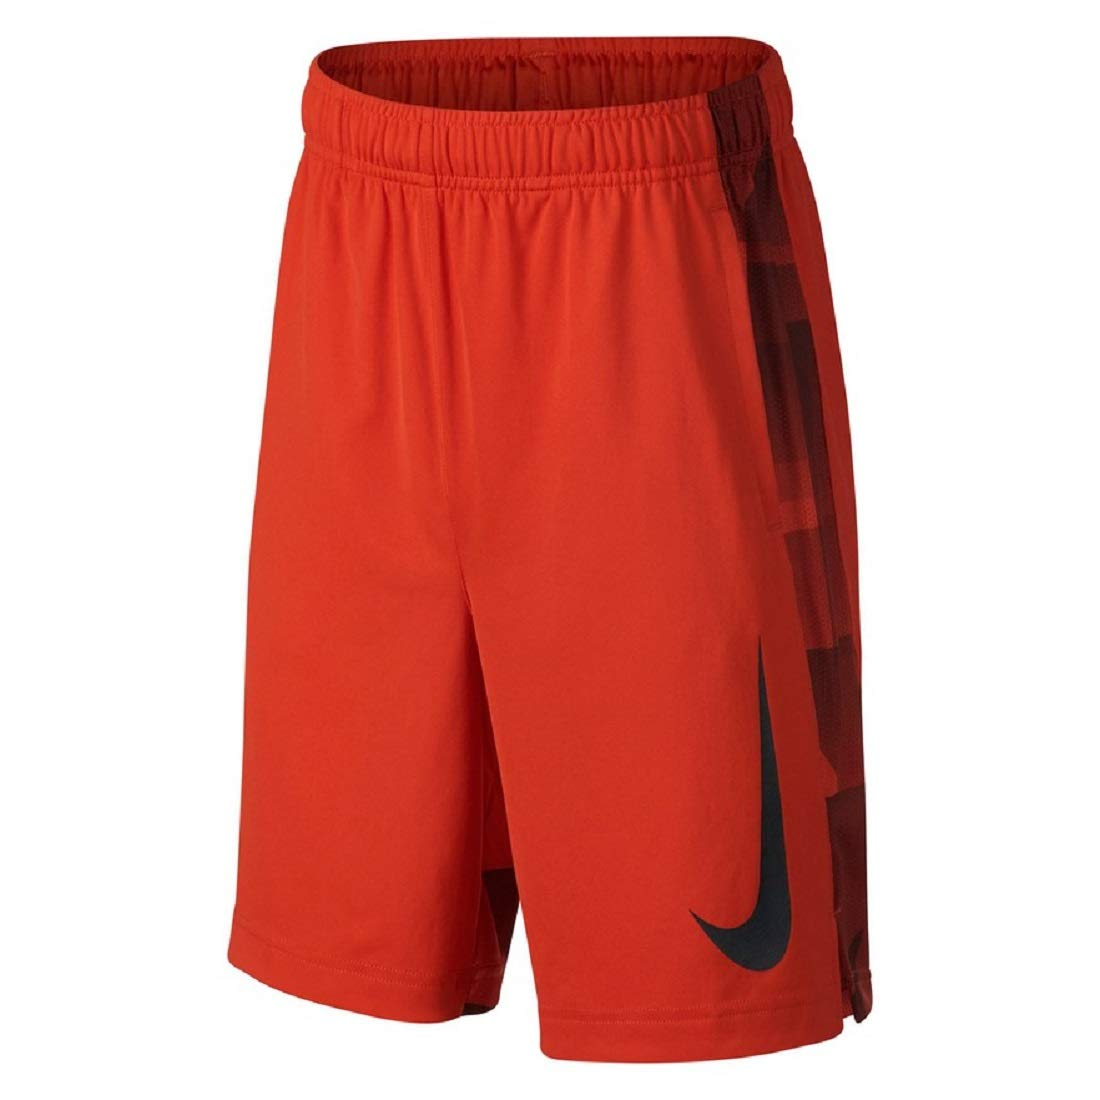 Nike Boys 8-20 Dri-FIT GFX Legacy Shorts (Habanero Red, Small)